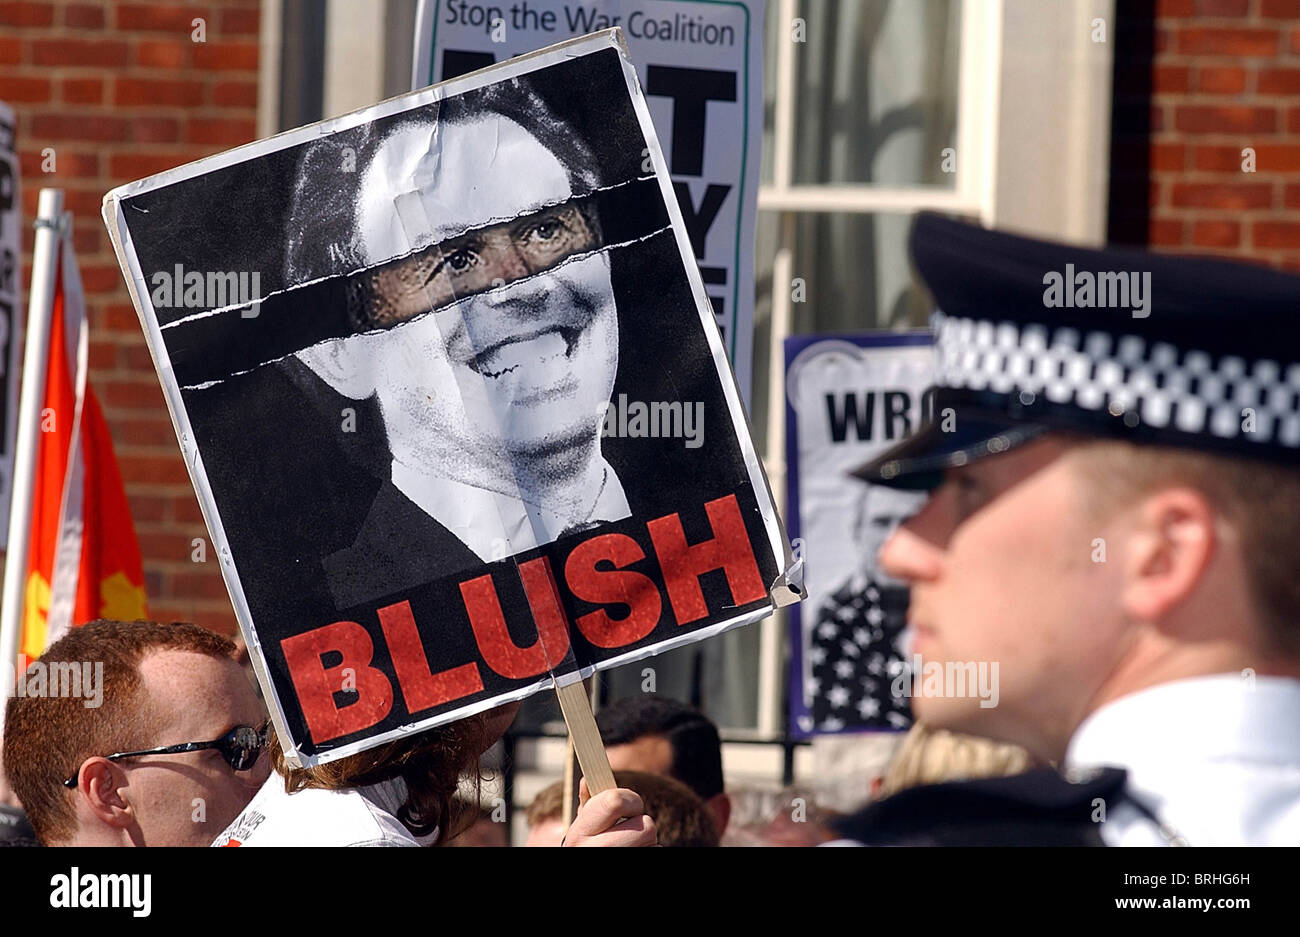 The anti-war demo in Grosvenor Square, London, 5-4-2003. Photo by John Robertson-Tel.07850 931219. - Stock Image